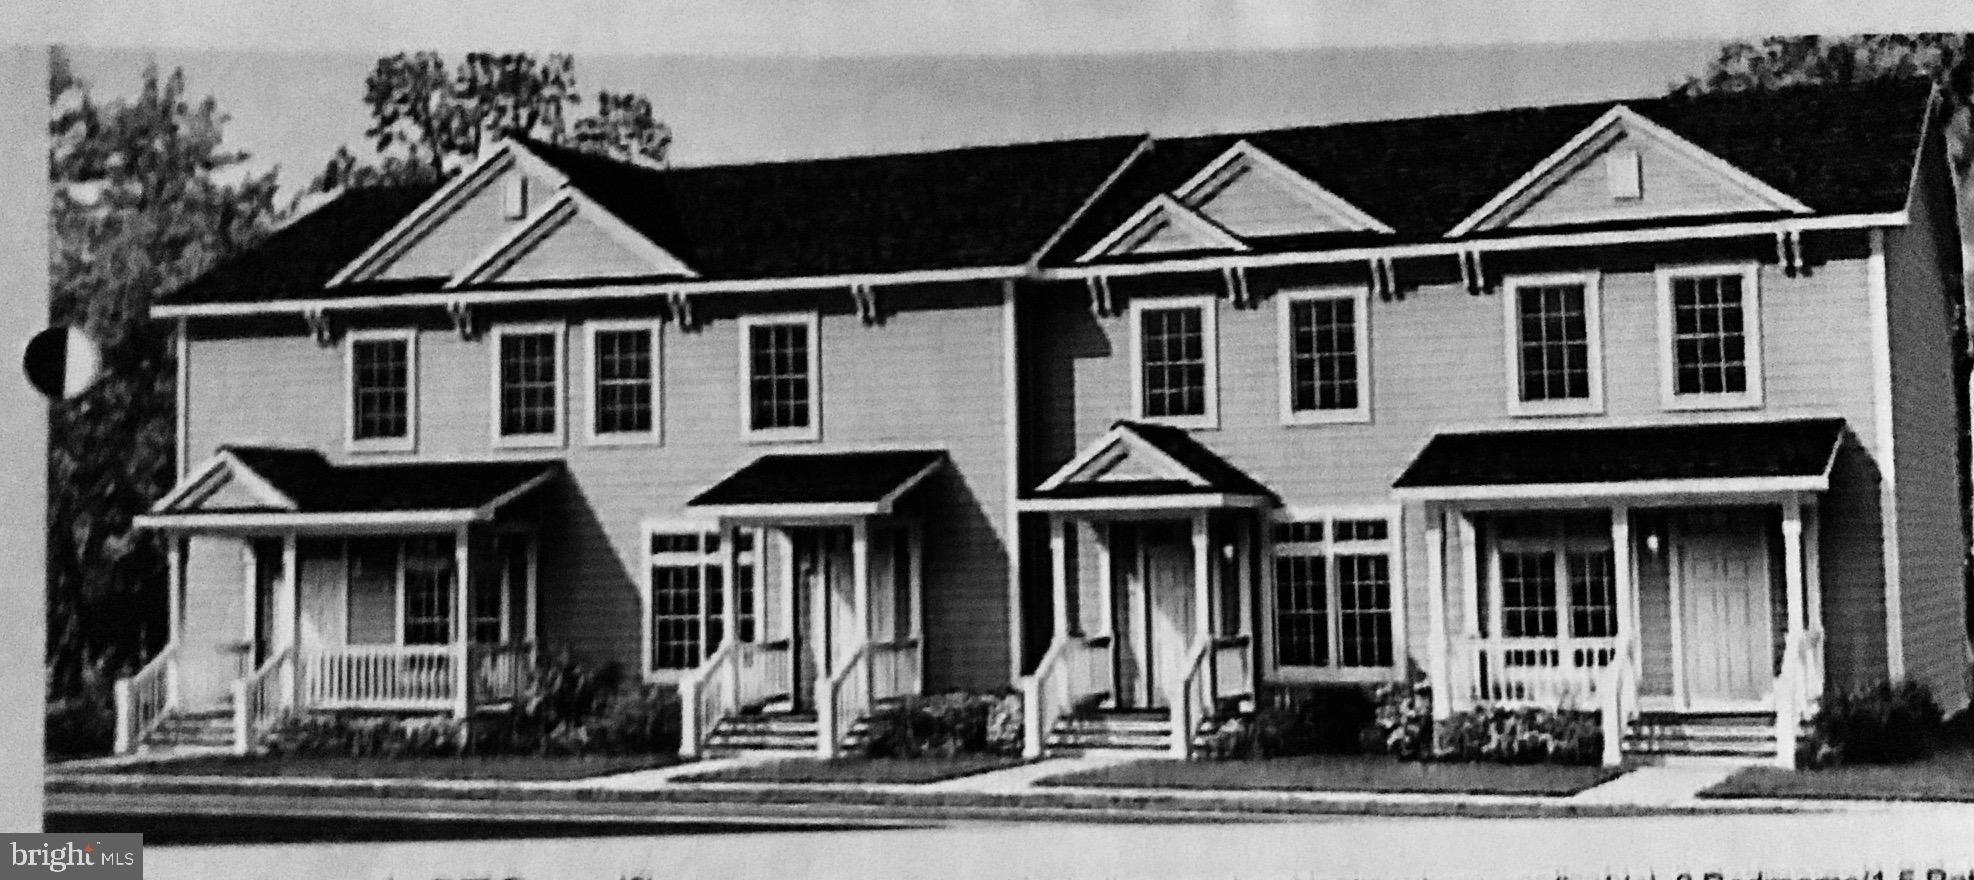 114-126 S BRADFORD STREET, ALLENTOWN, PA 18109